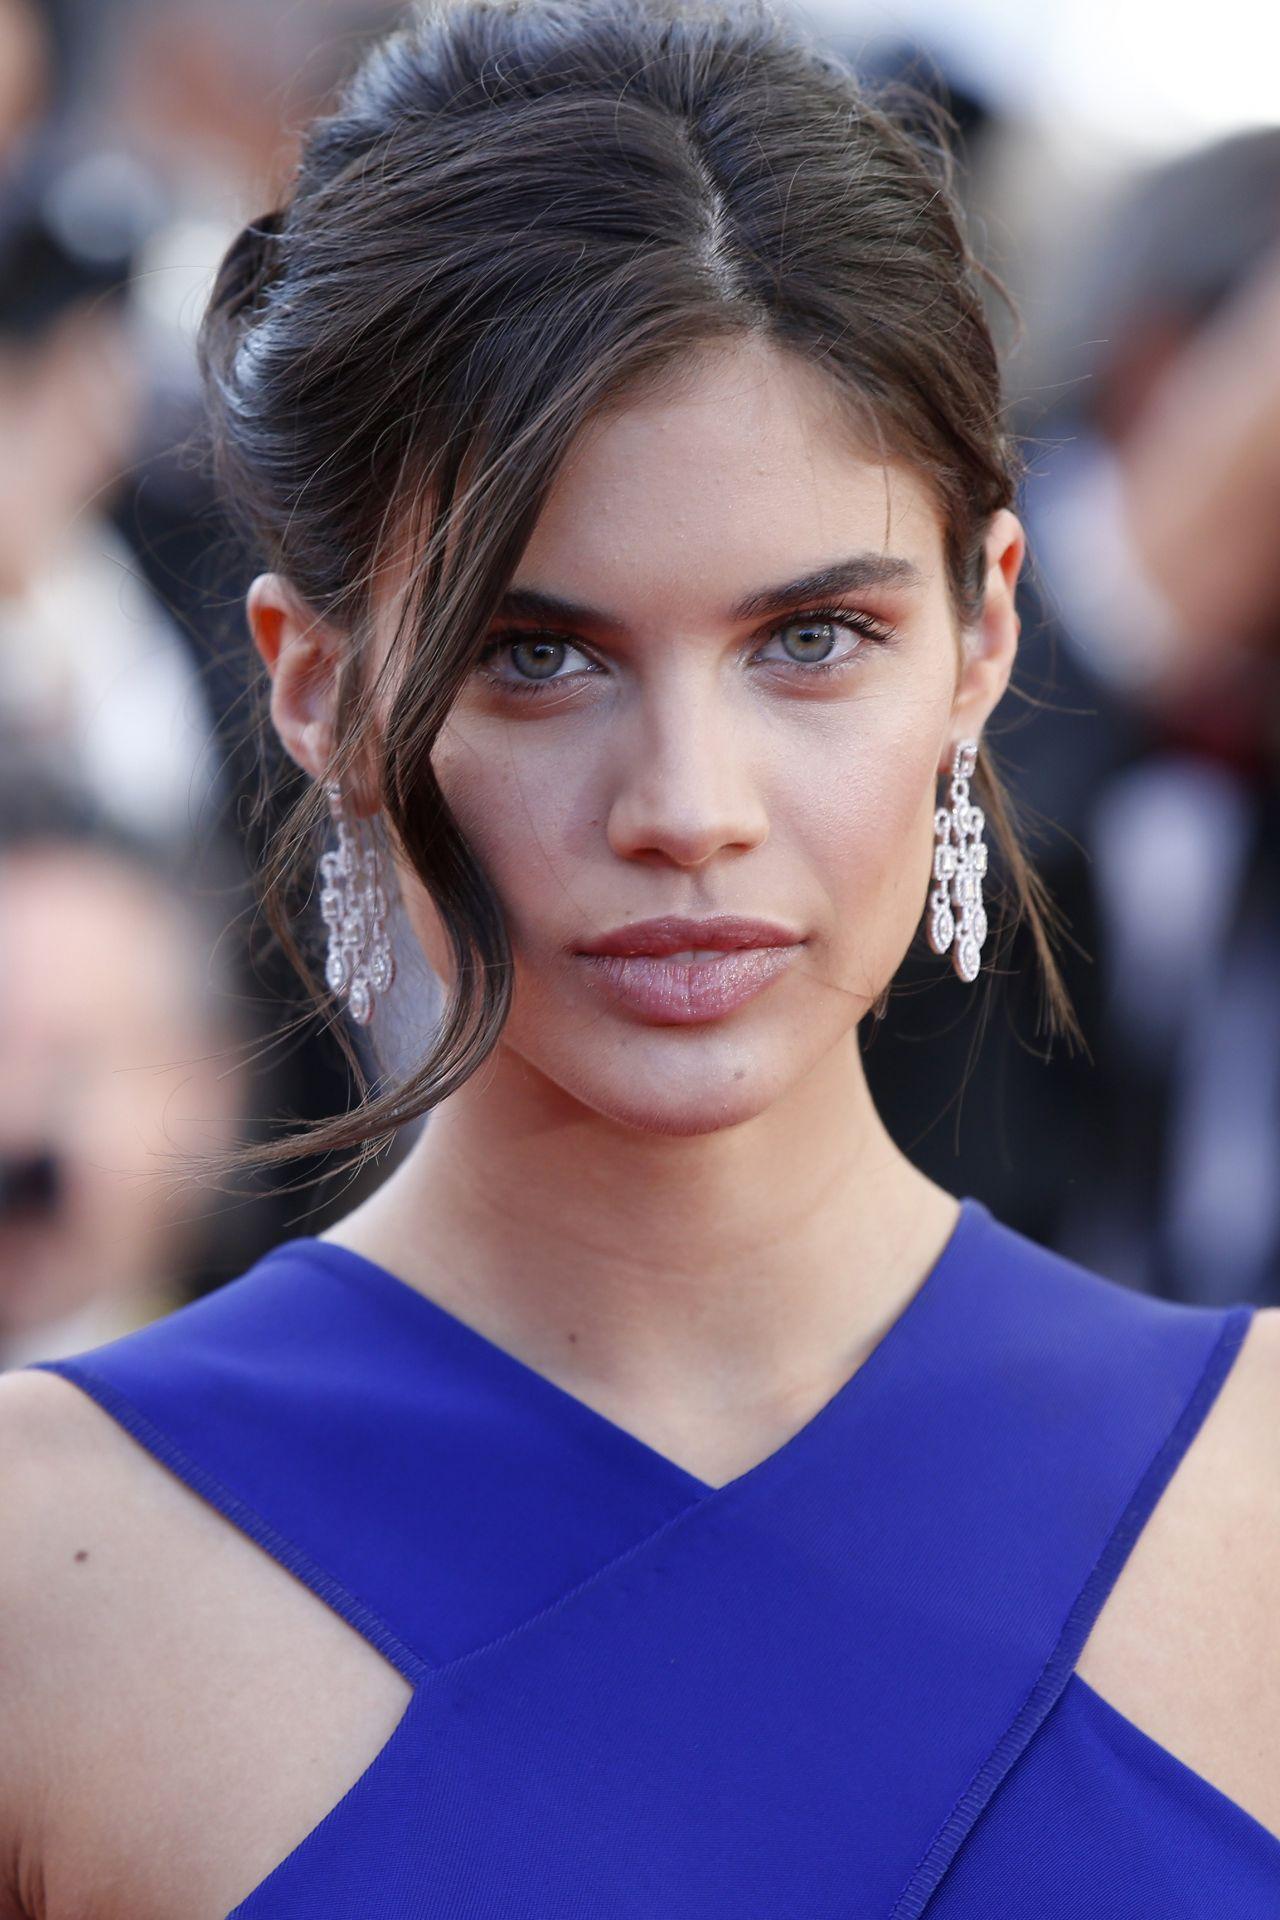 Sara Sampaio Youth Premiere At 2015 Cannes Film Festivala